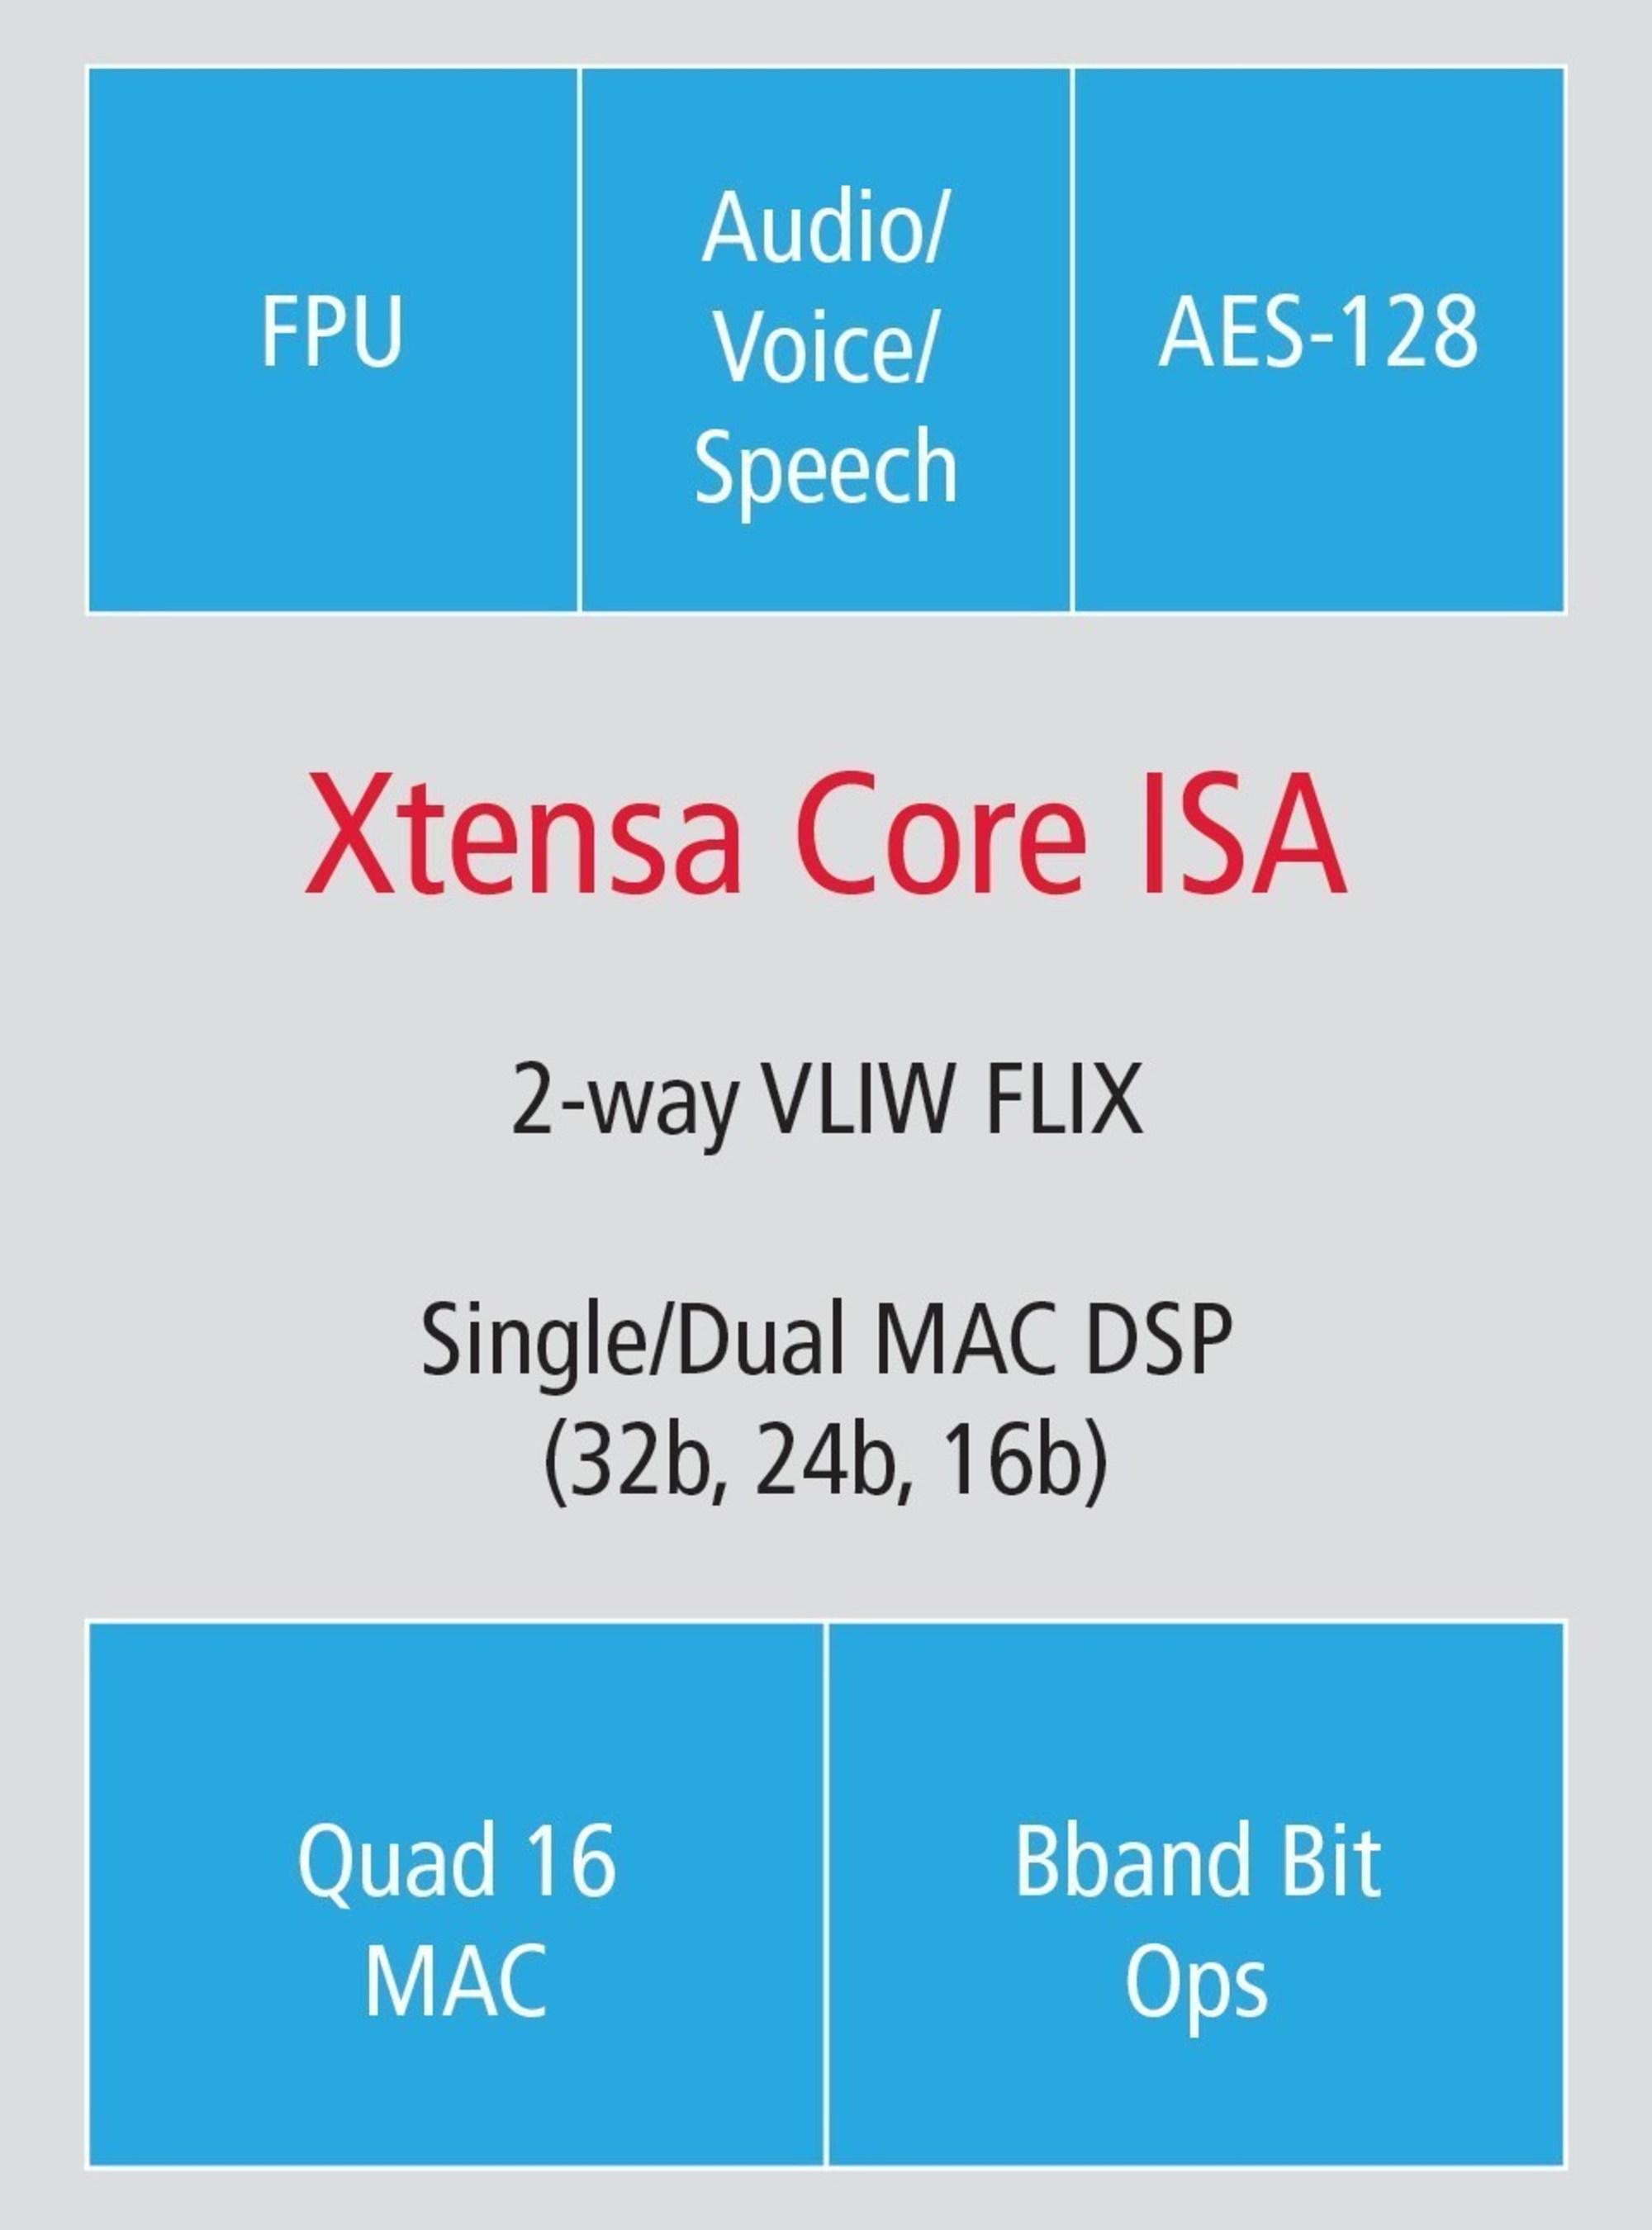 Tensilica Fusion DSP configuration options